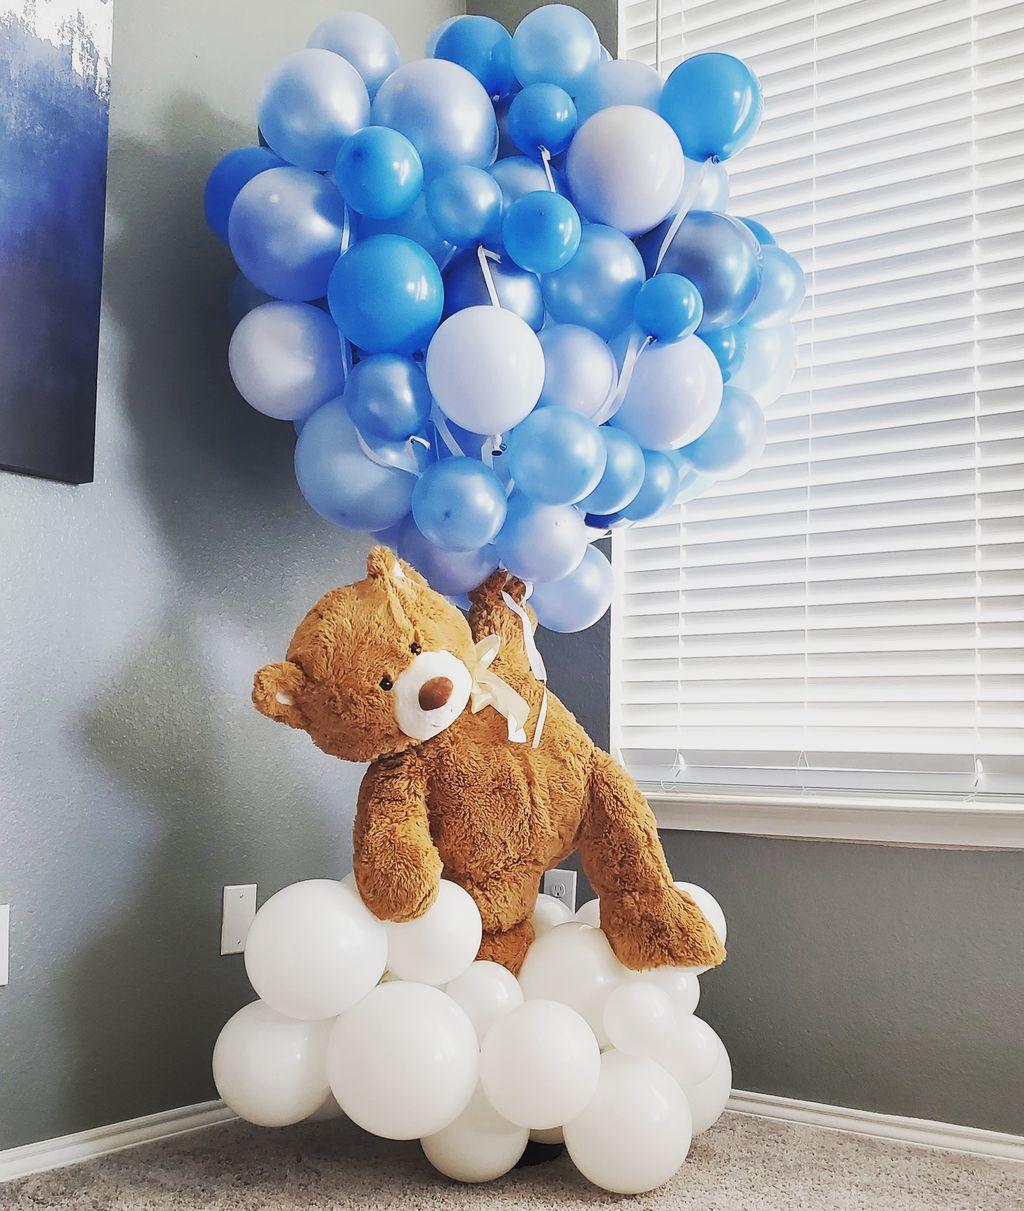 Floating Bear and Hot Air Balloons